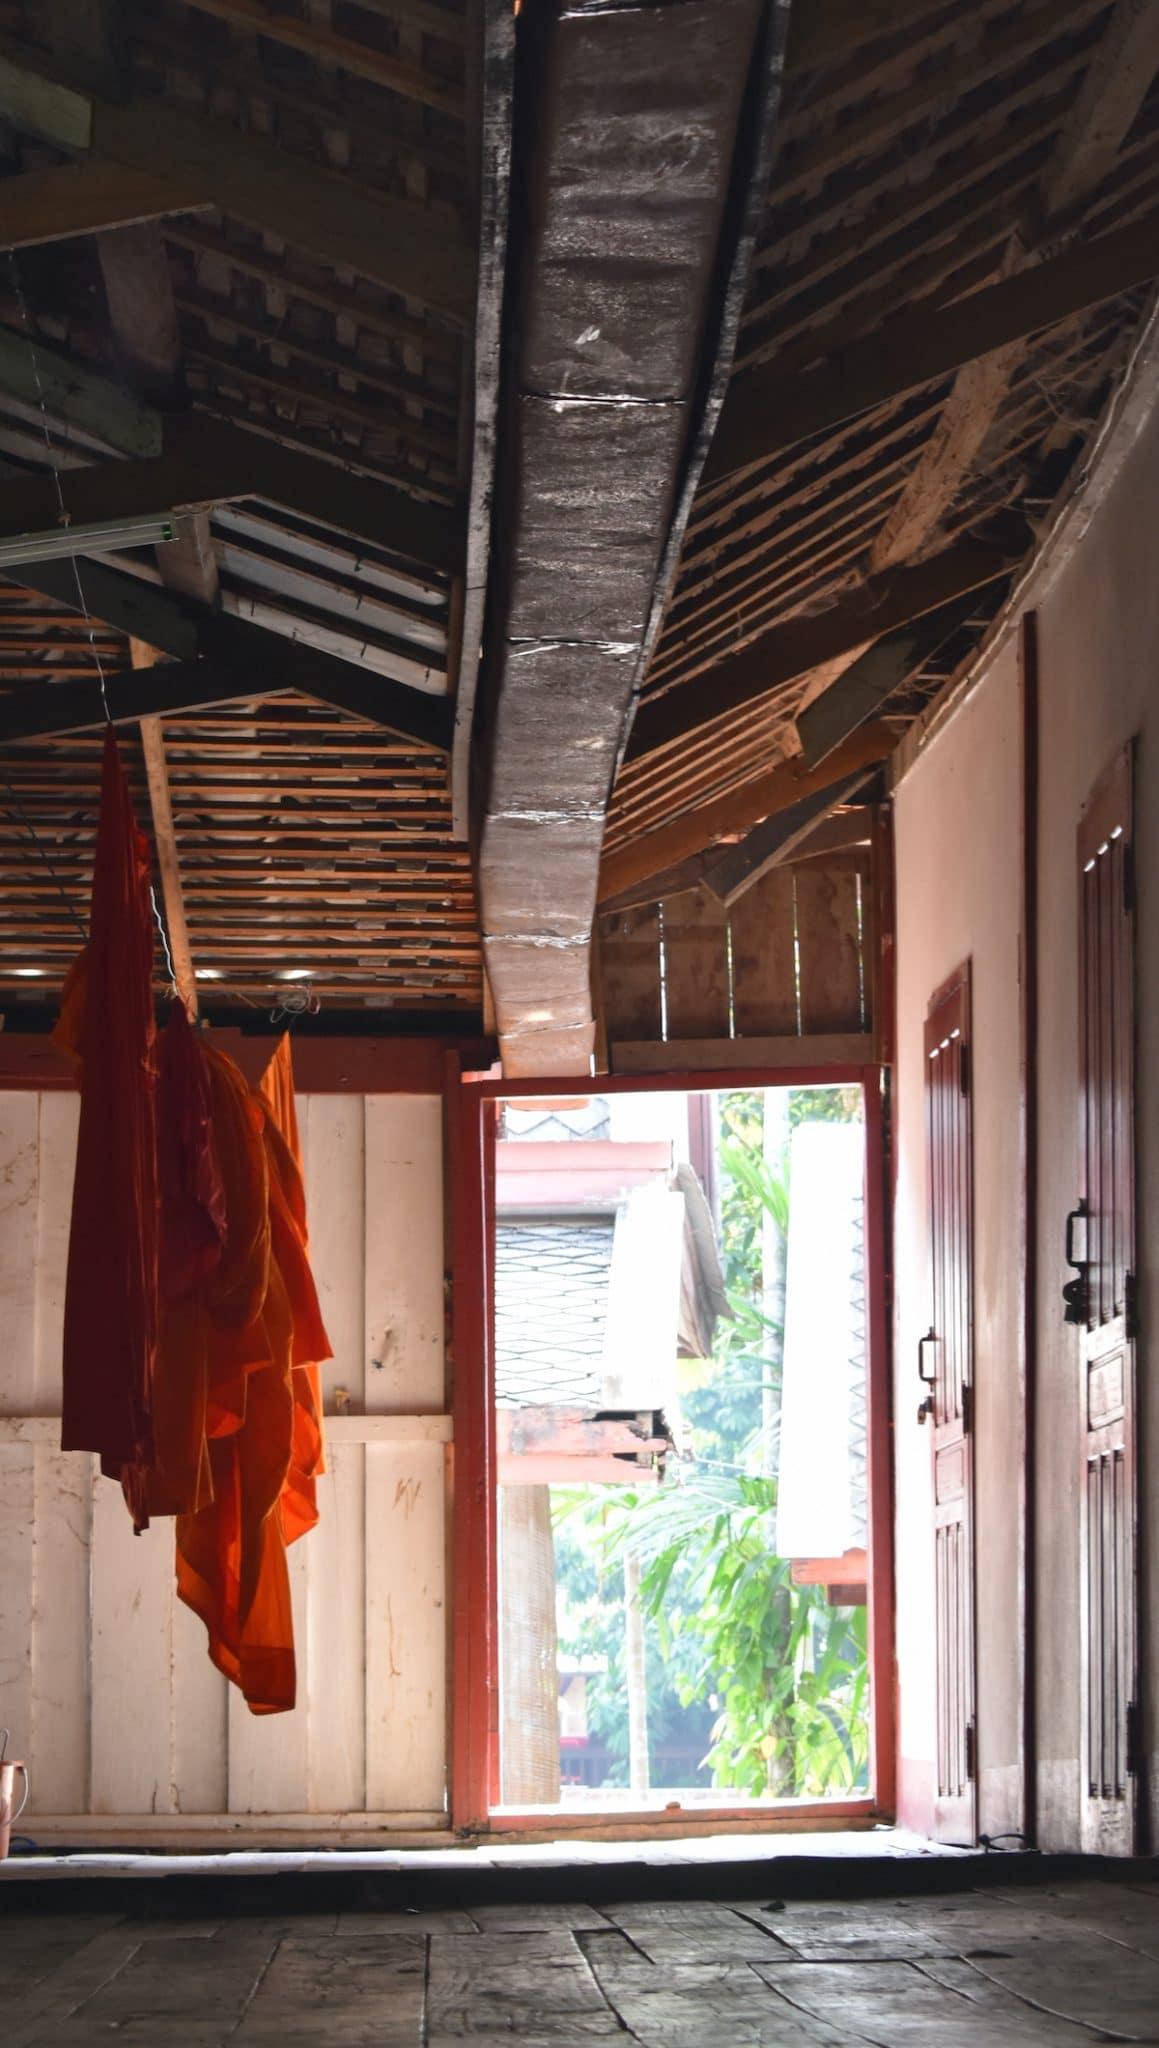 Soif d'Asie de Cerise : Luang Prabang